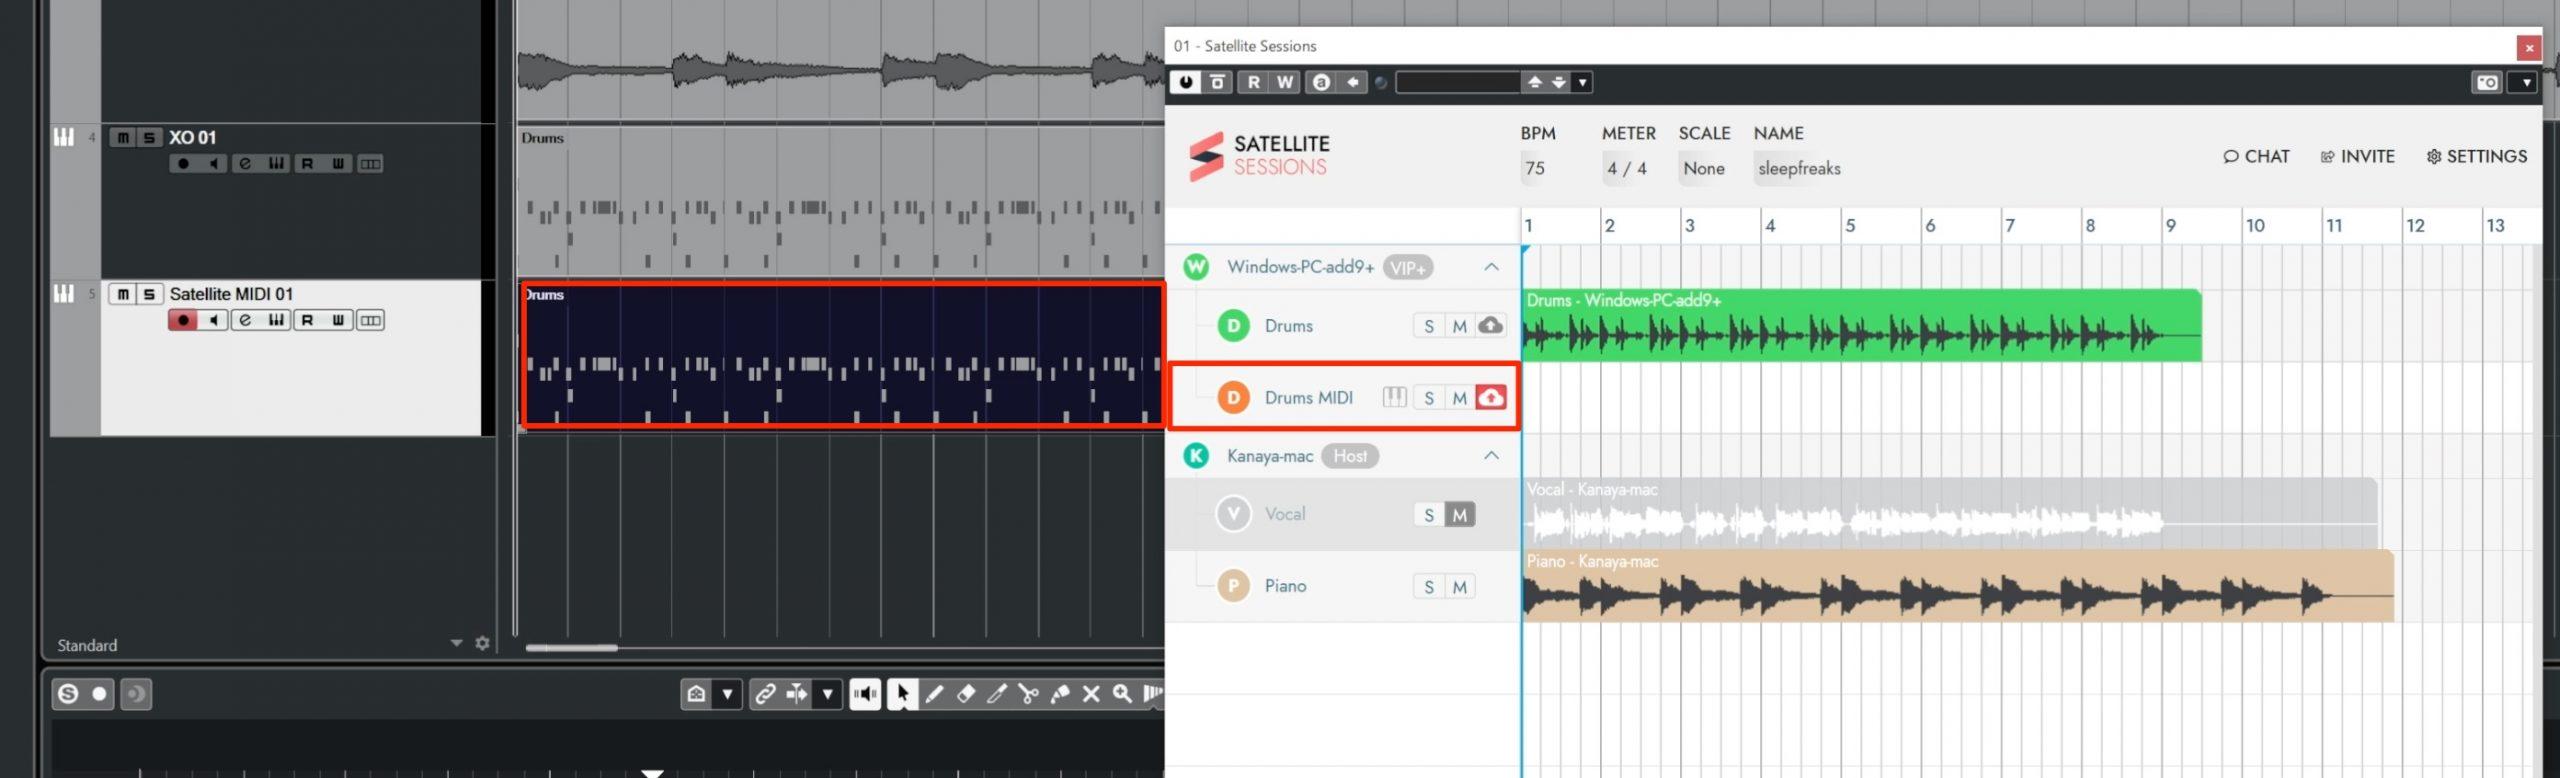 MIDI_「Satellite_MIDI」